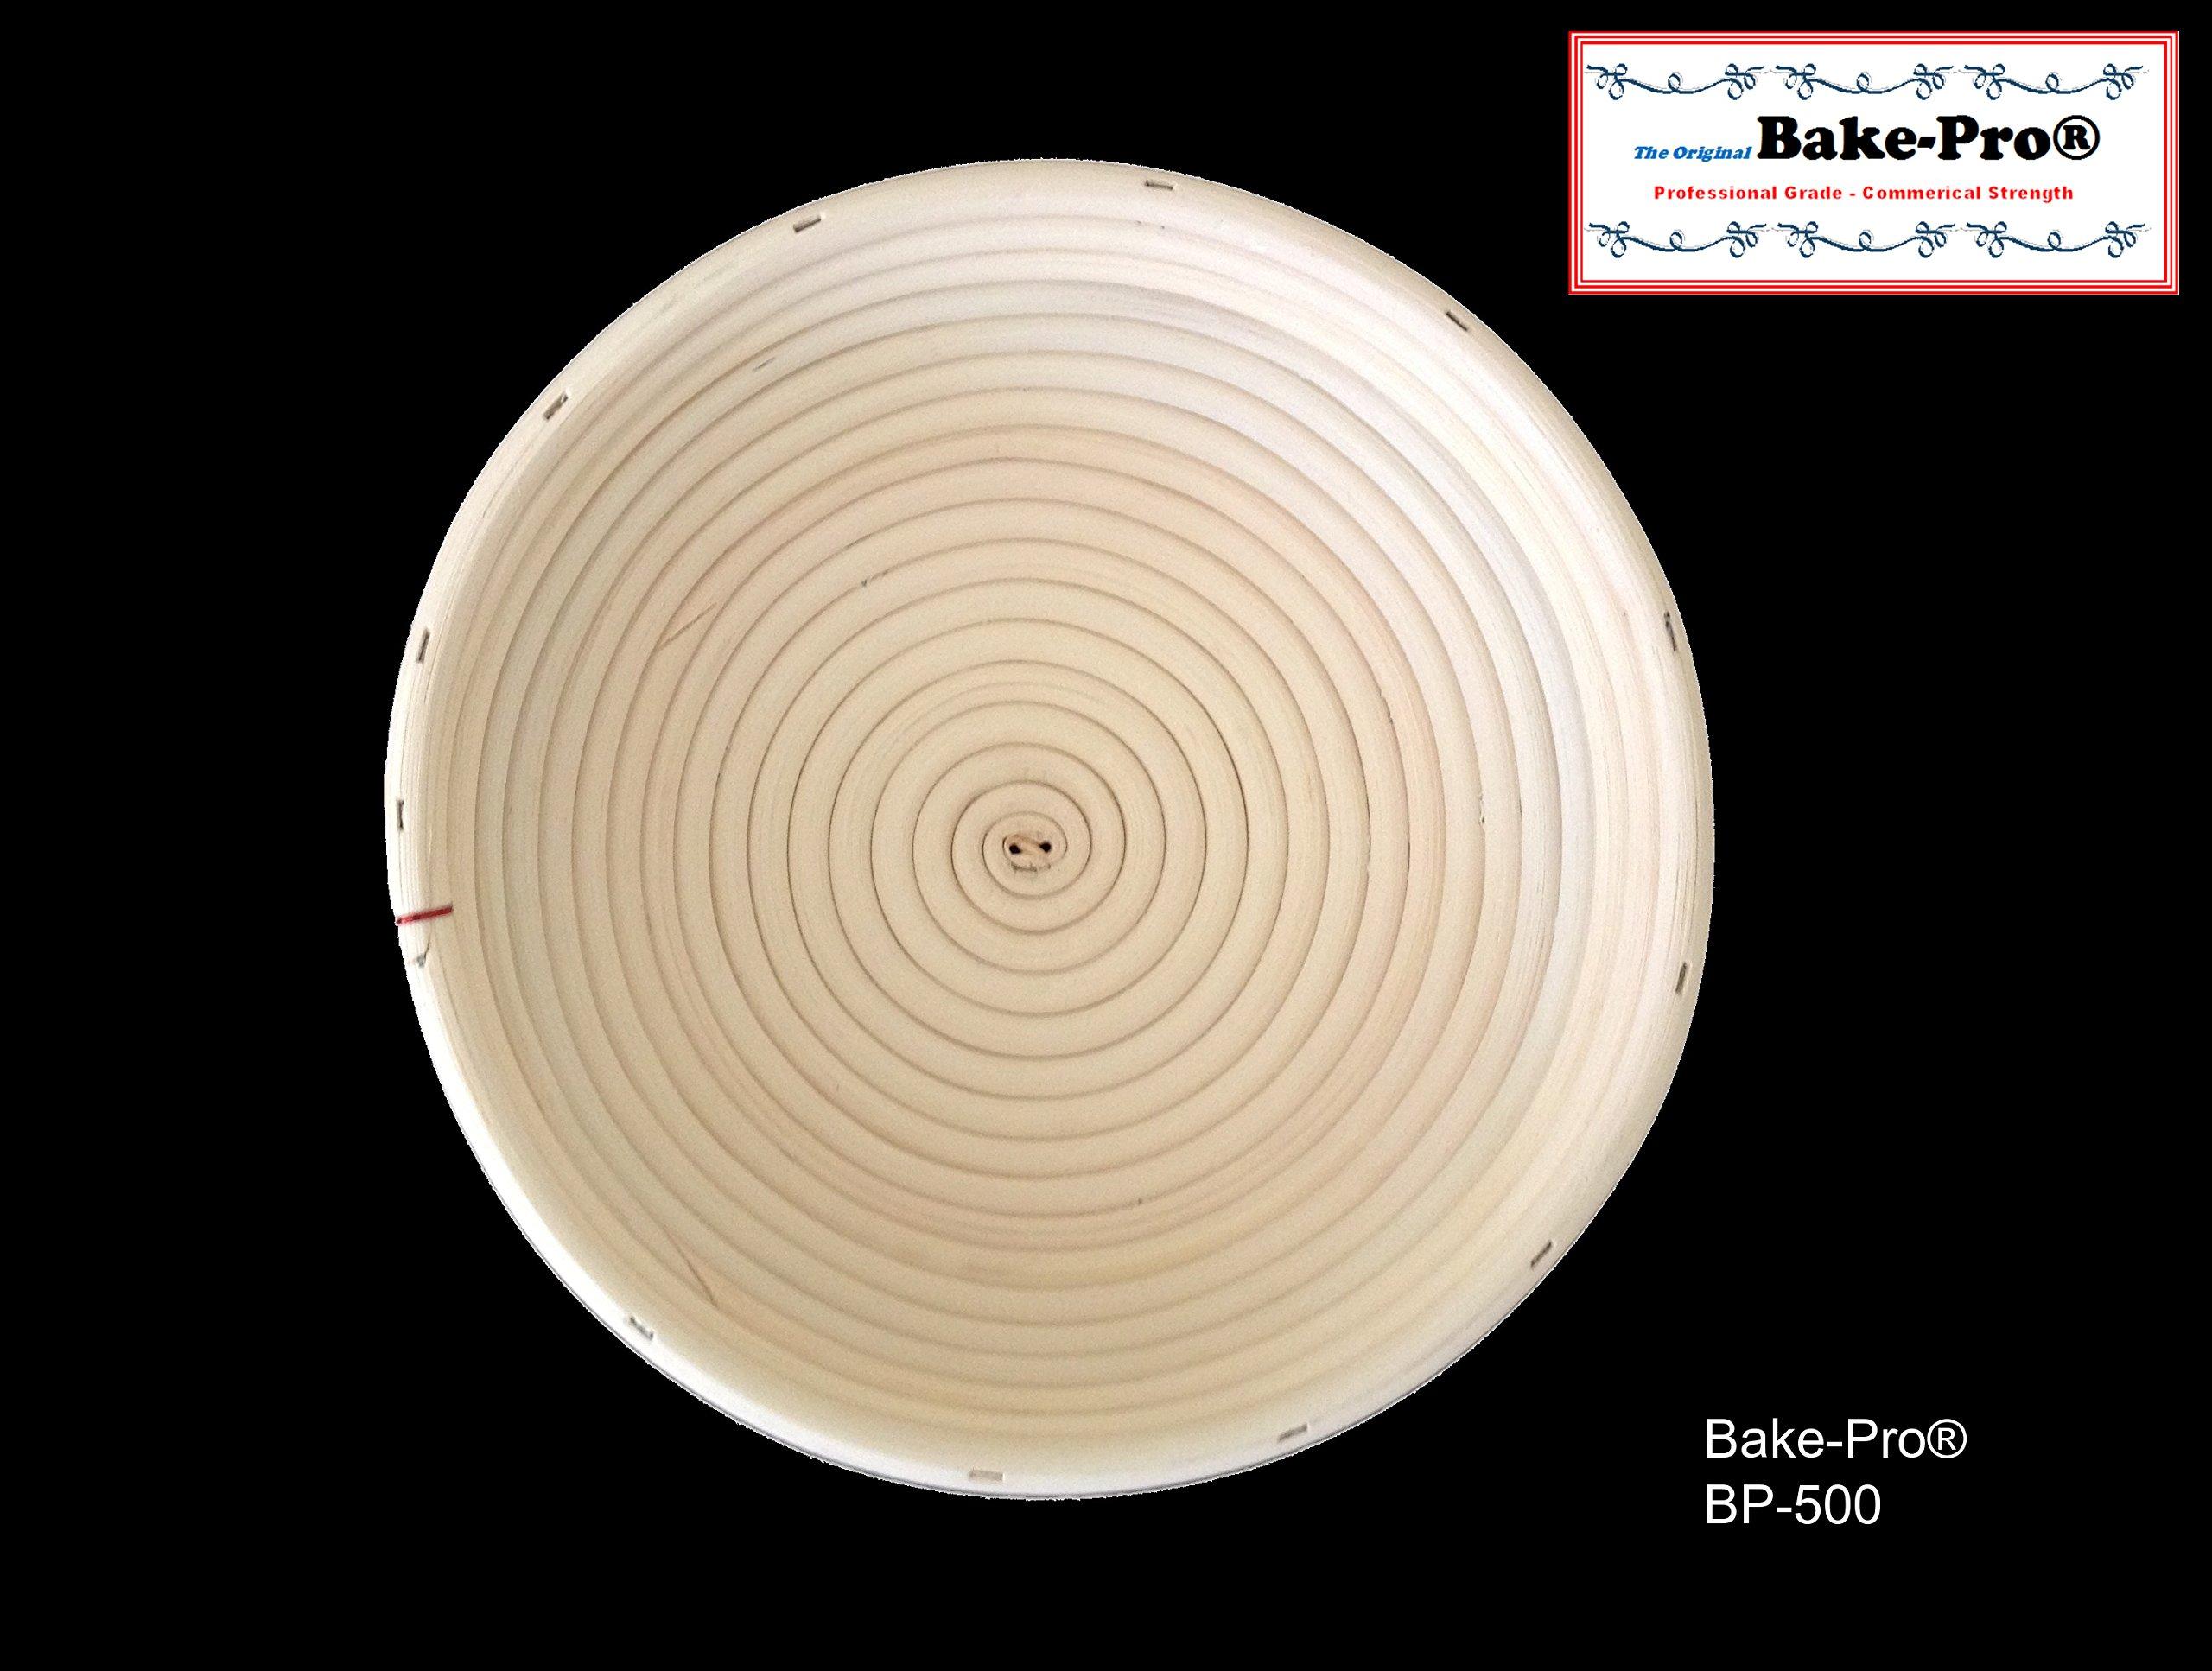 Pack of Two Bake-Pro Brotform 8.25'' Round BP-500